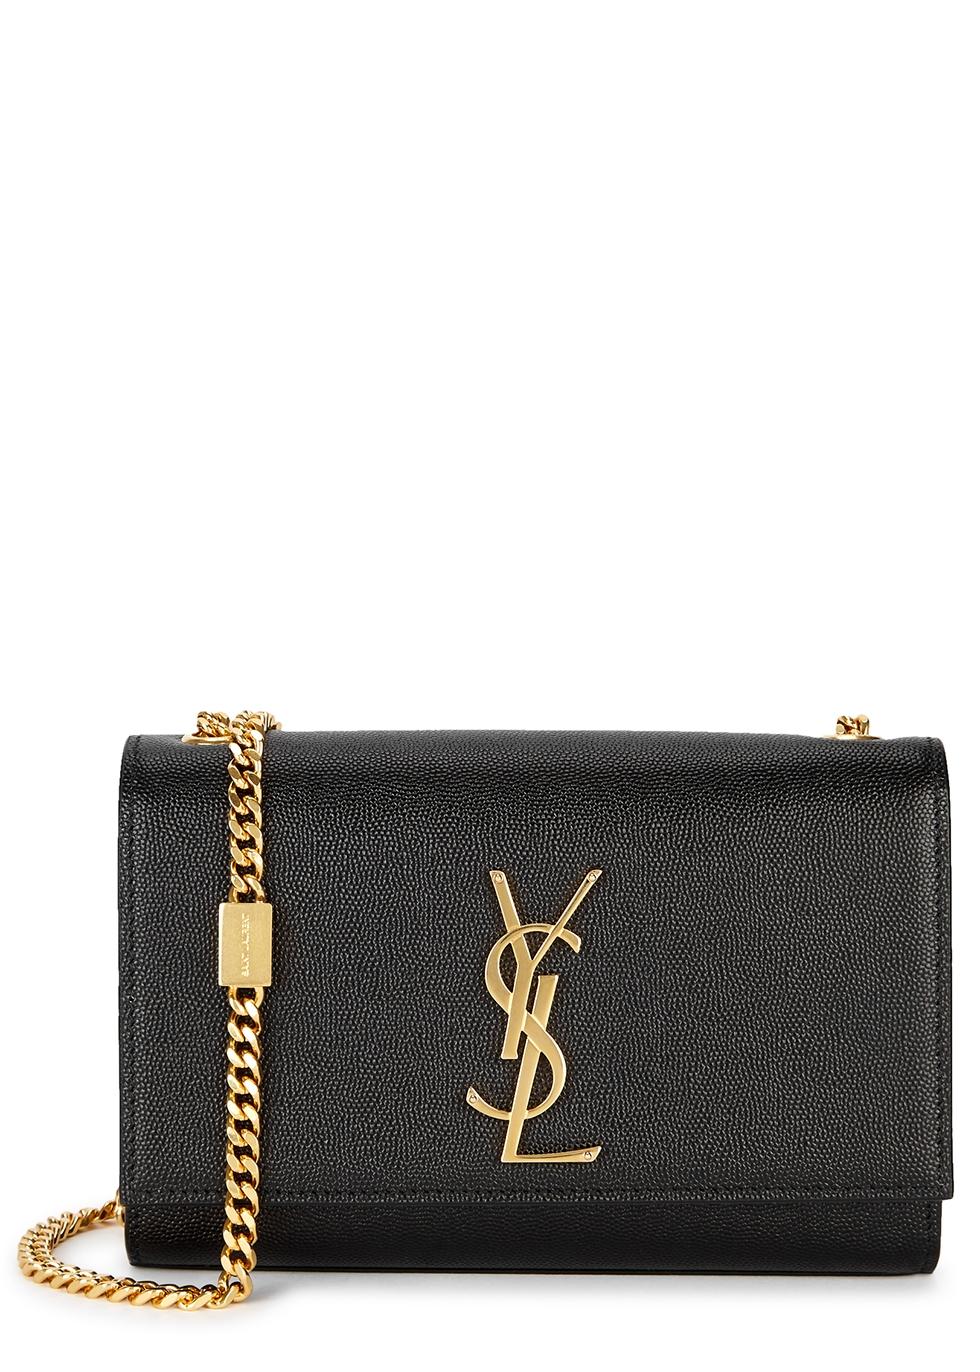 YSL Saint Laurent So Kate Nude Powder Clutch Bag - Medium